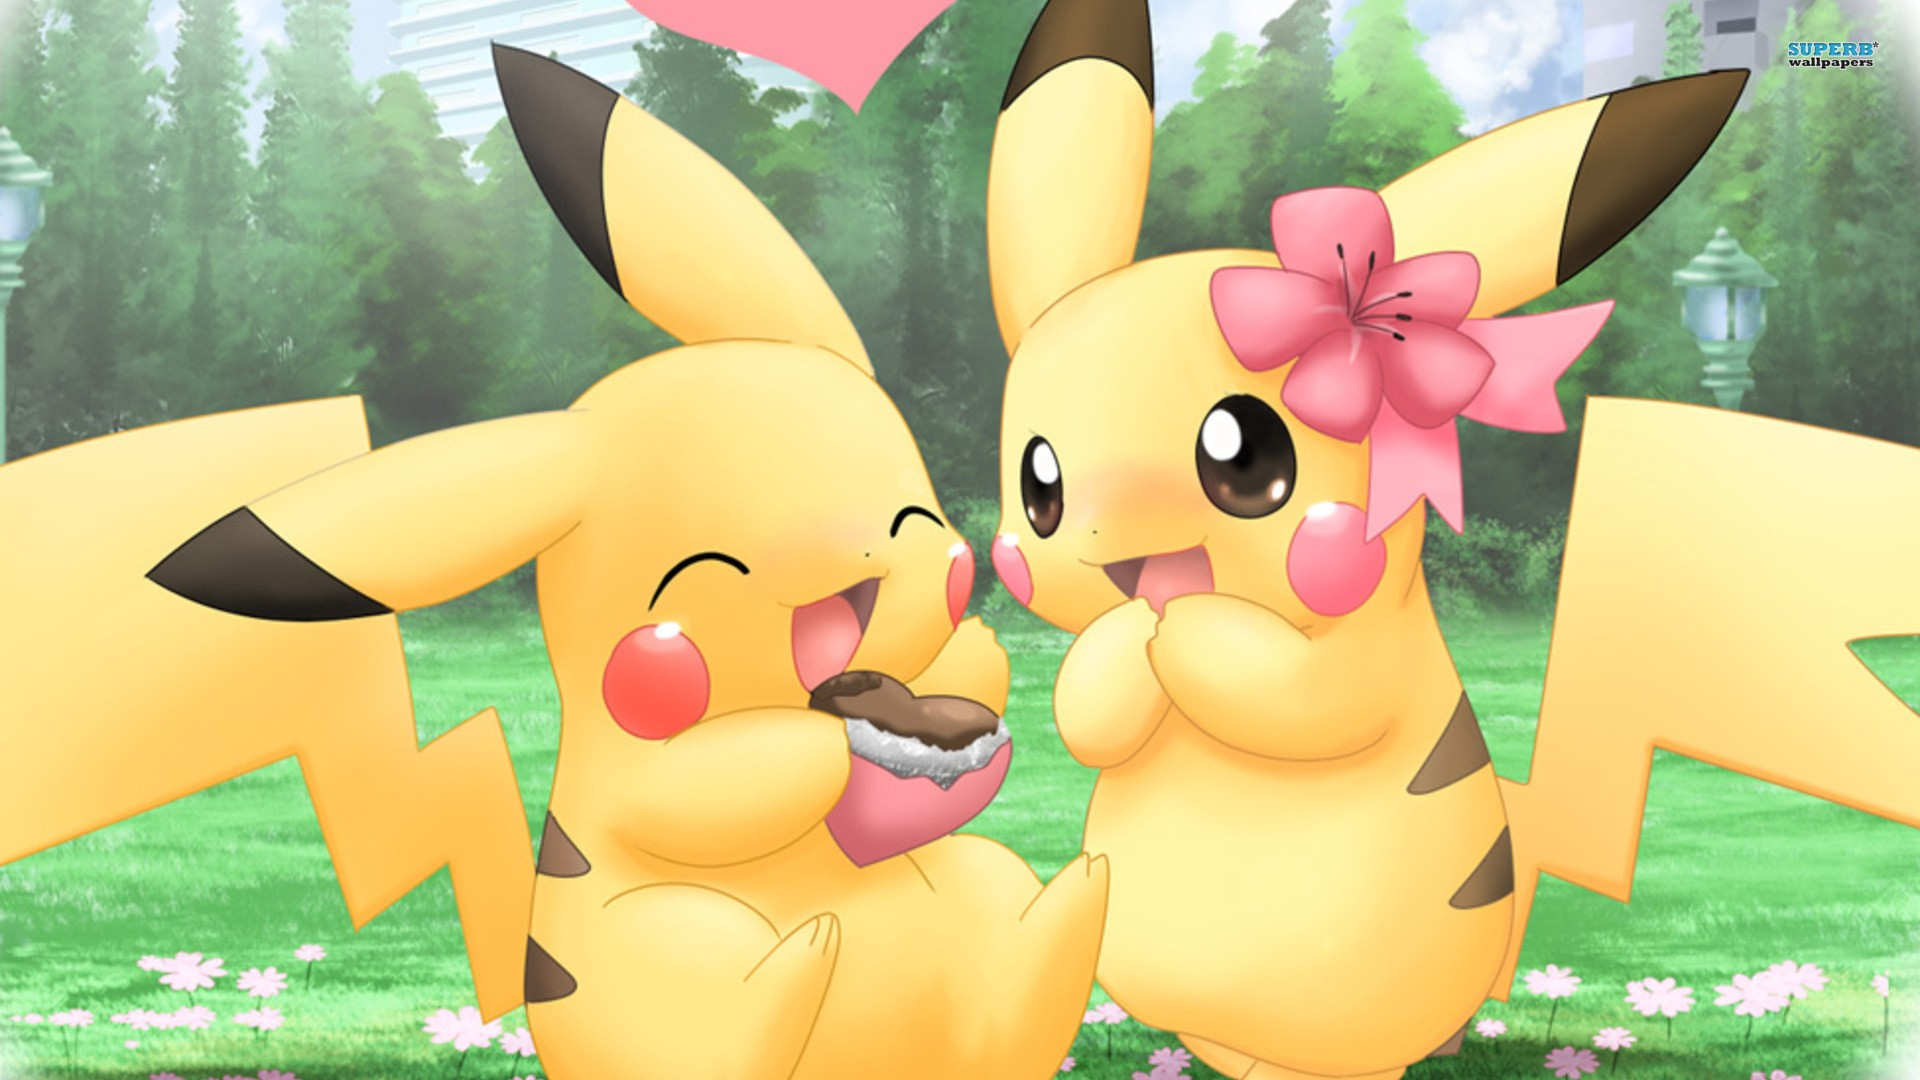 Pikachu Pokemon Cute Couples HD Wallpaper of Cartoon   hdwallpaper2013 1920x1080